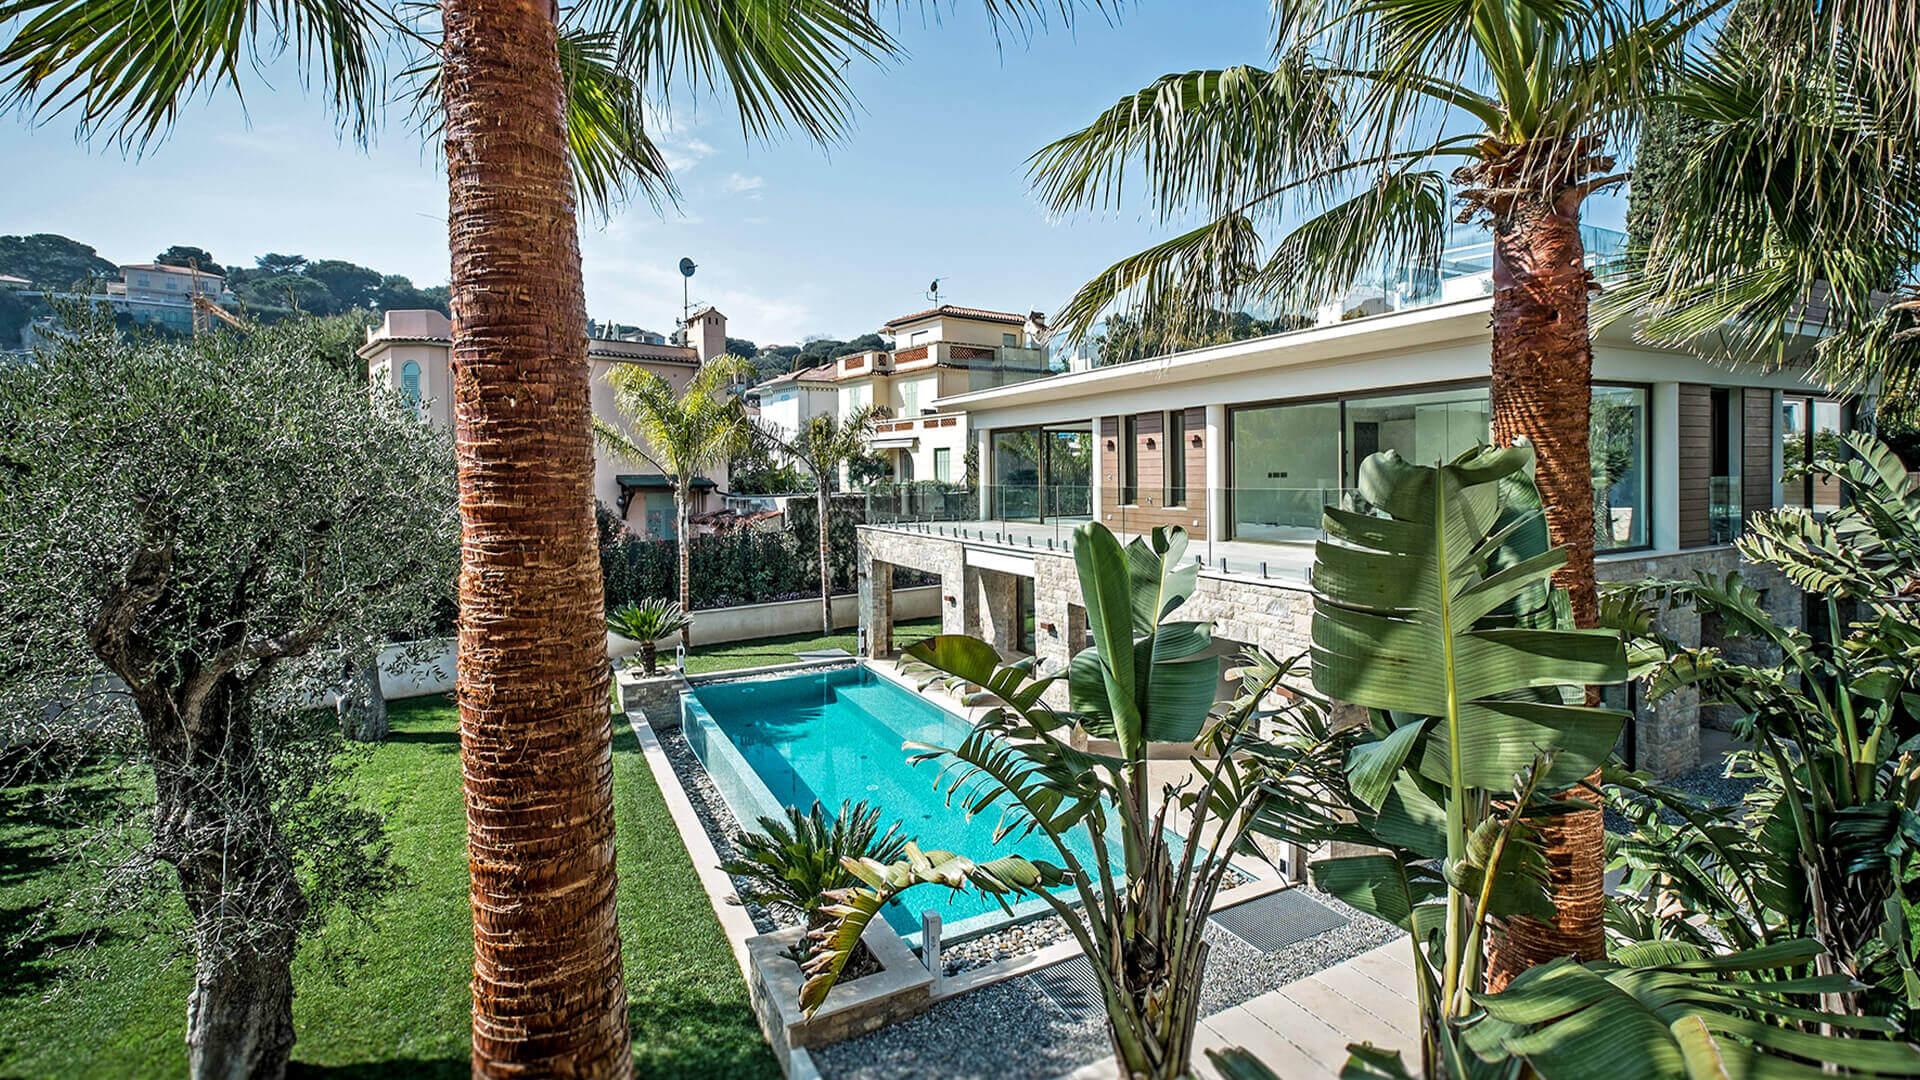 Garden and villa with swimmingpool